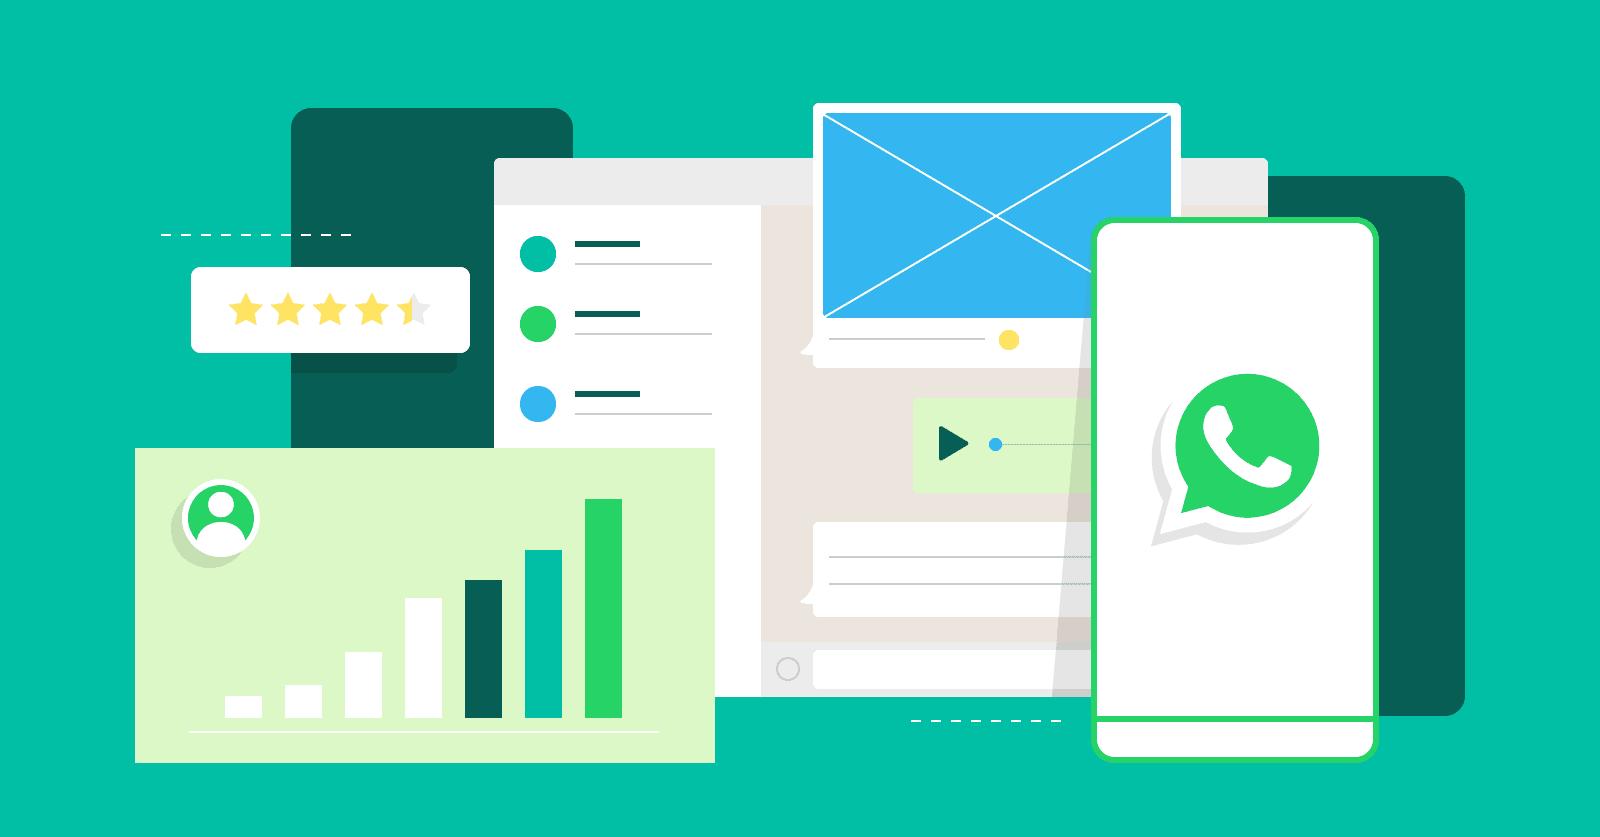 WhatsApp User Statistics: How Many People Use WhatsApp?